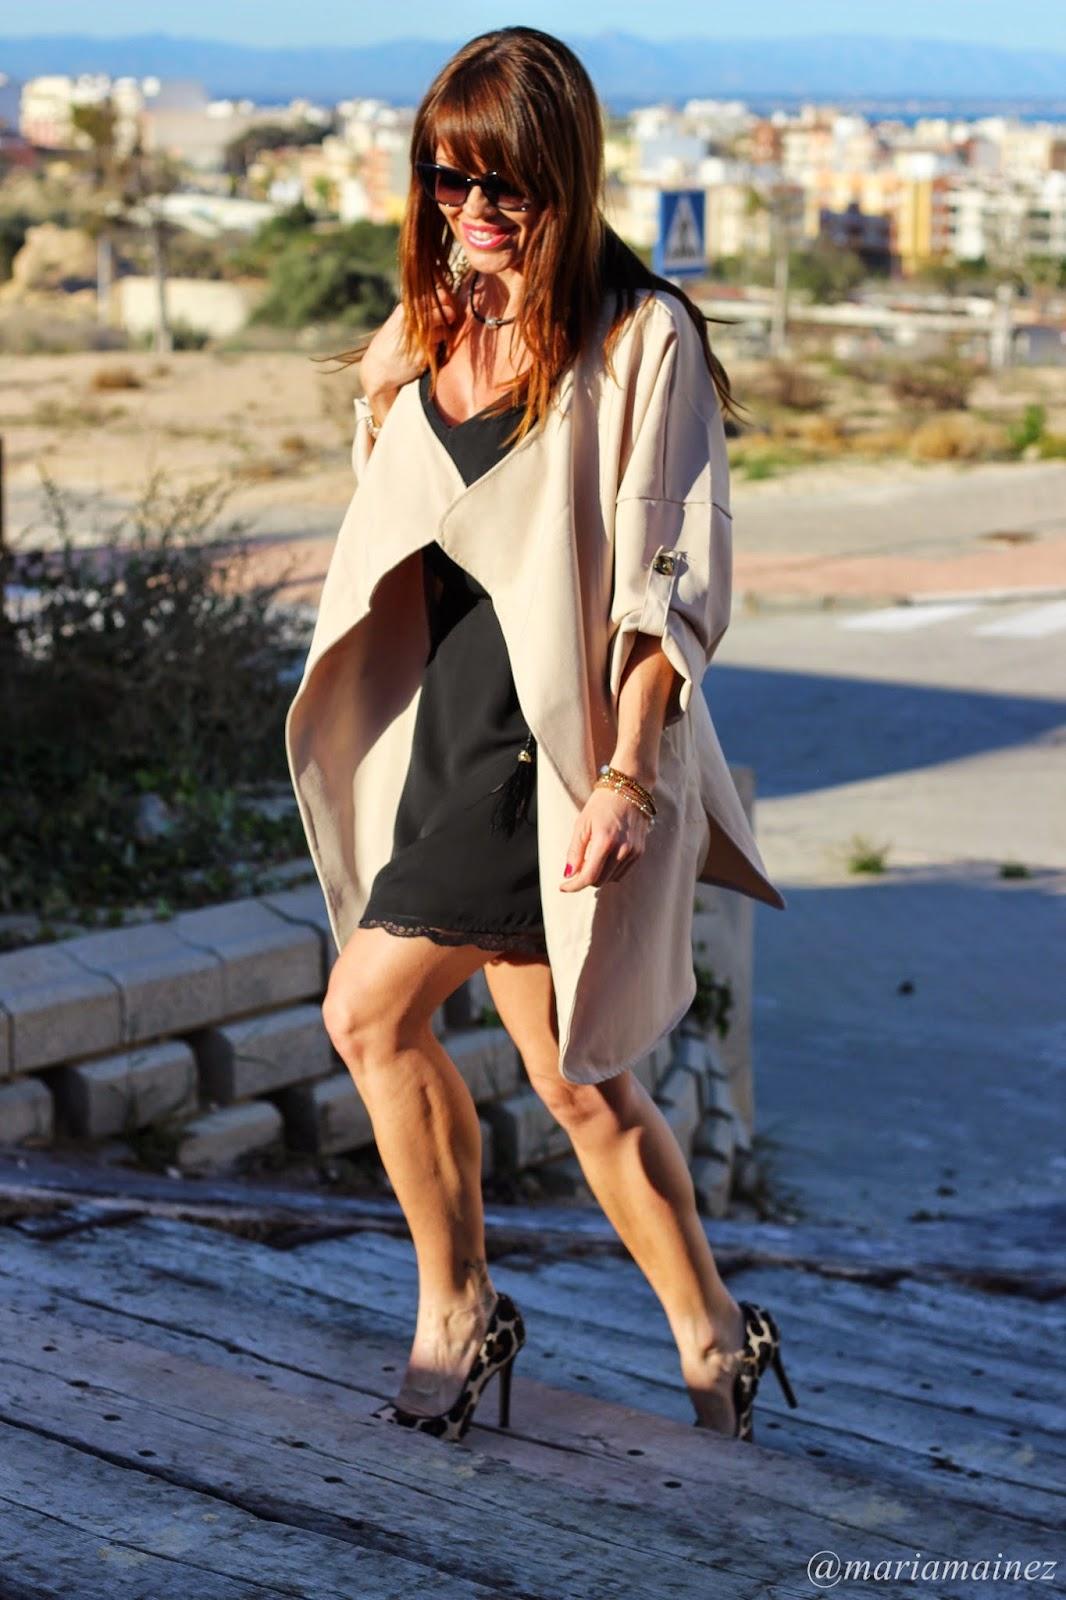 Gabardina verano - Sheinside - Stilettos leopardo - Fashion blogger - Gafas Chanel